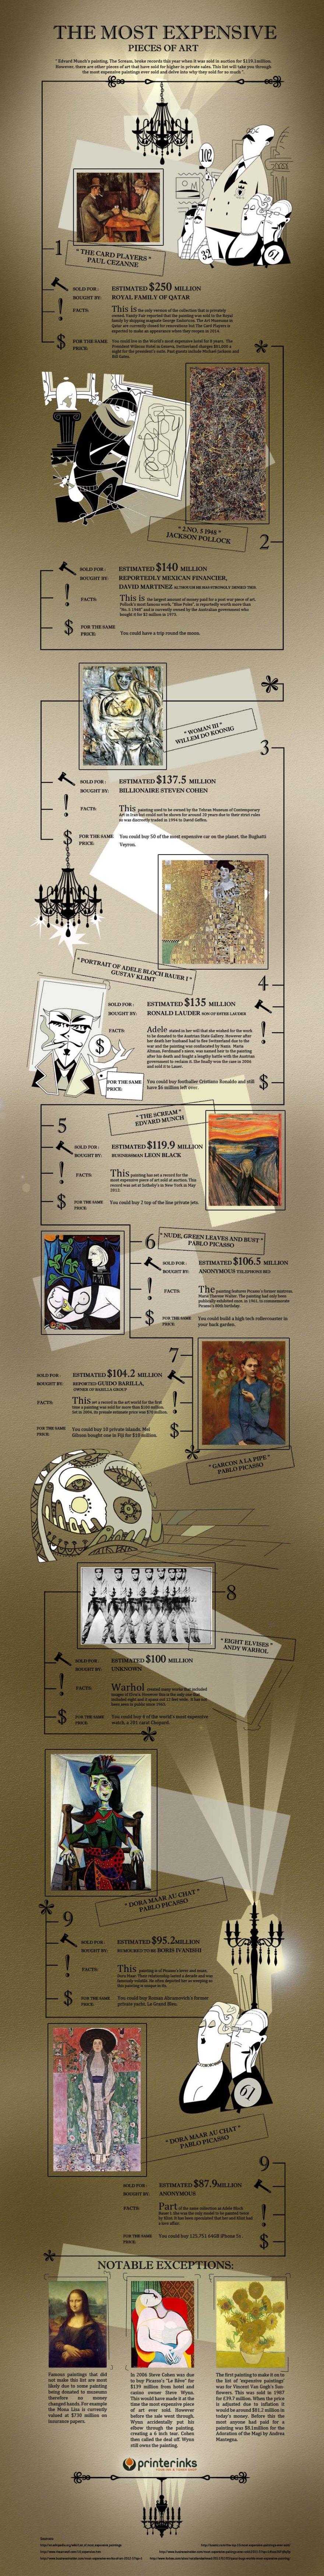 paintings artwork expensive